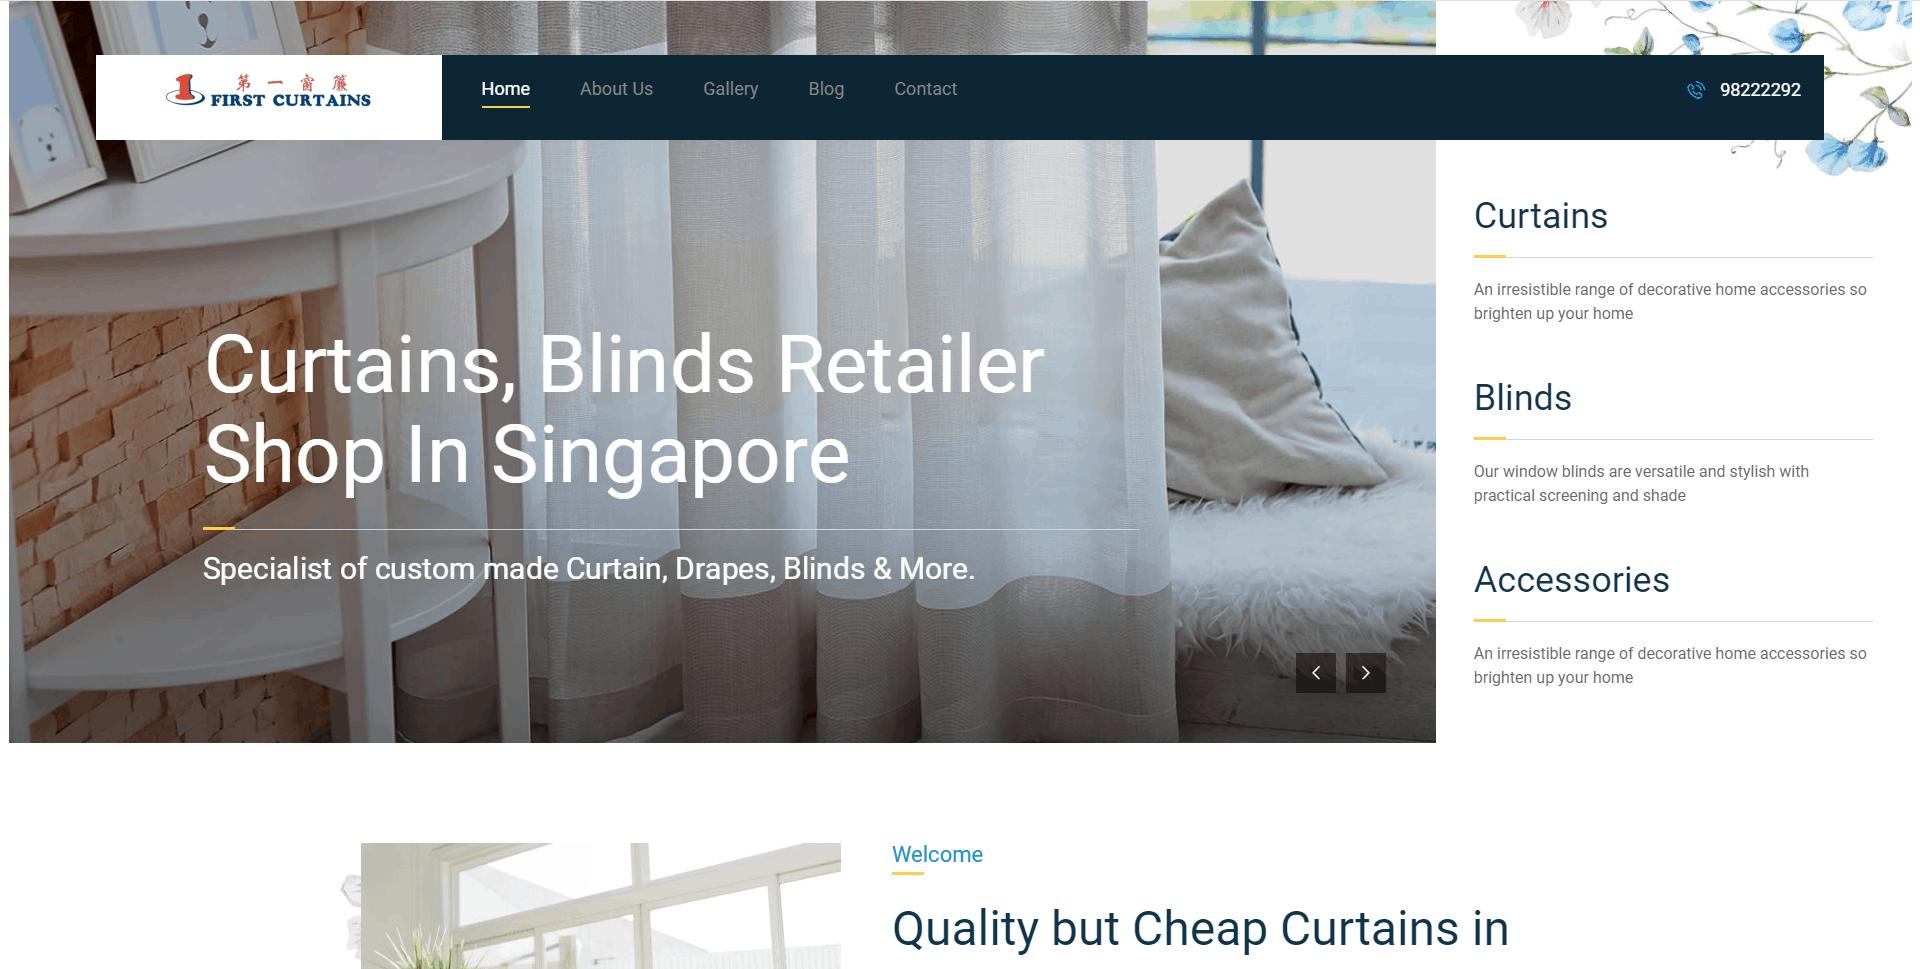 Website Design Services Singapore 134